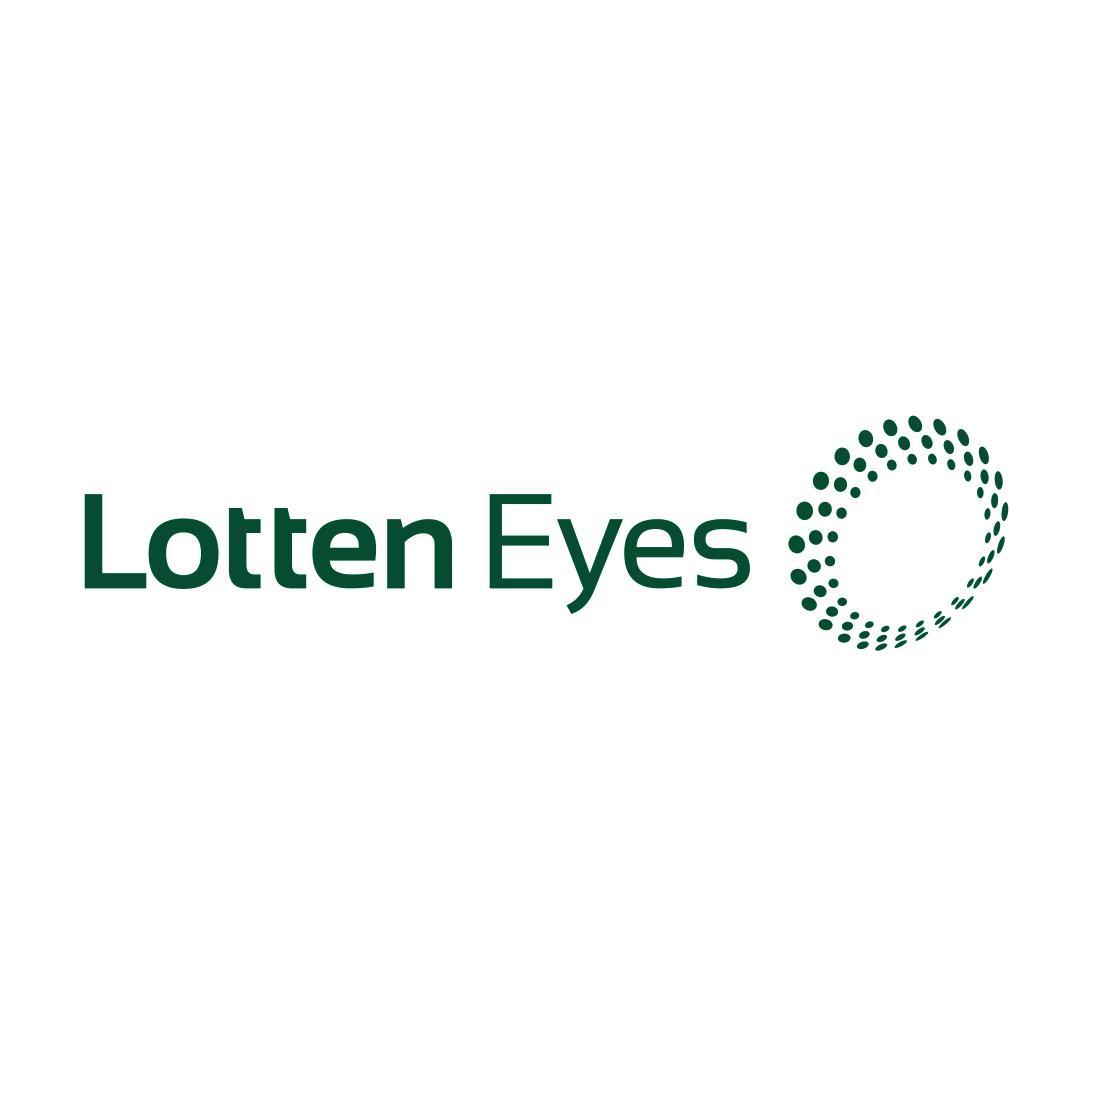 Lotten Eyes - Vila Conceição